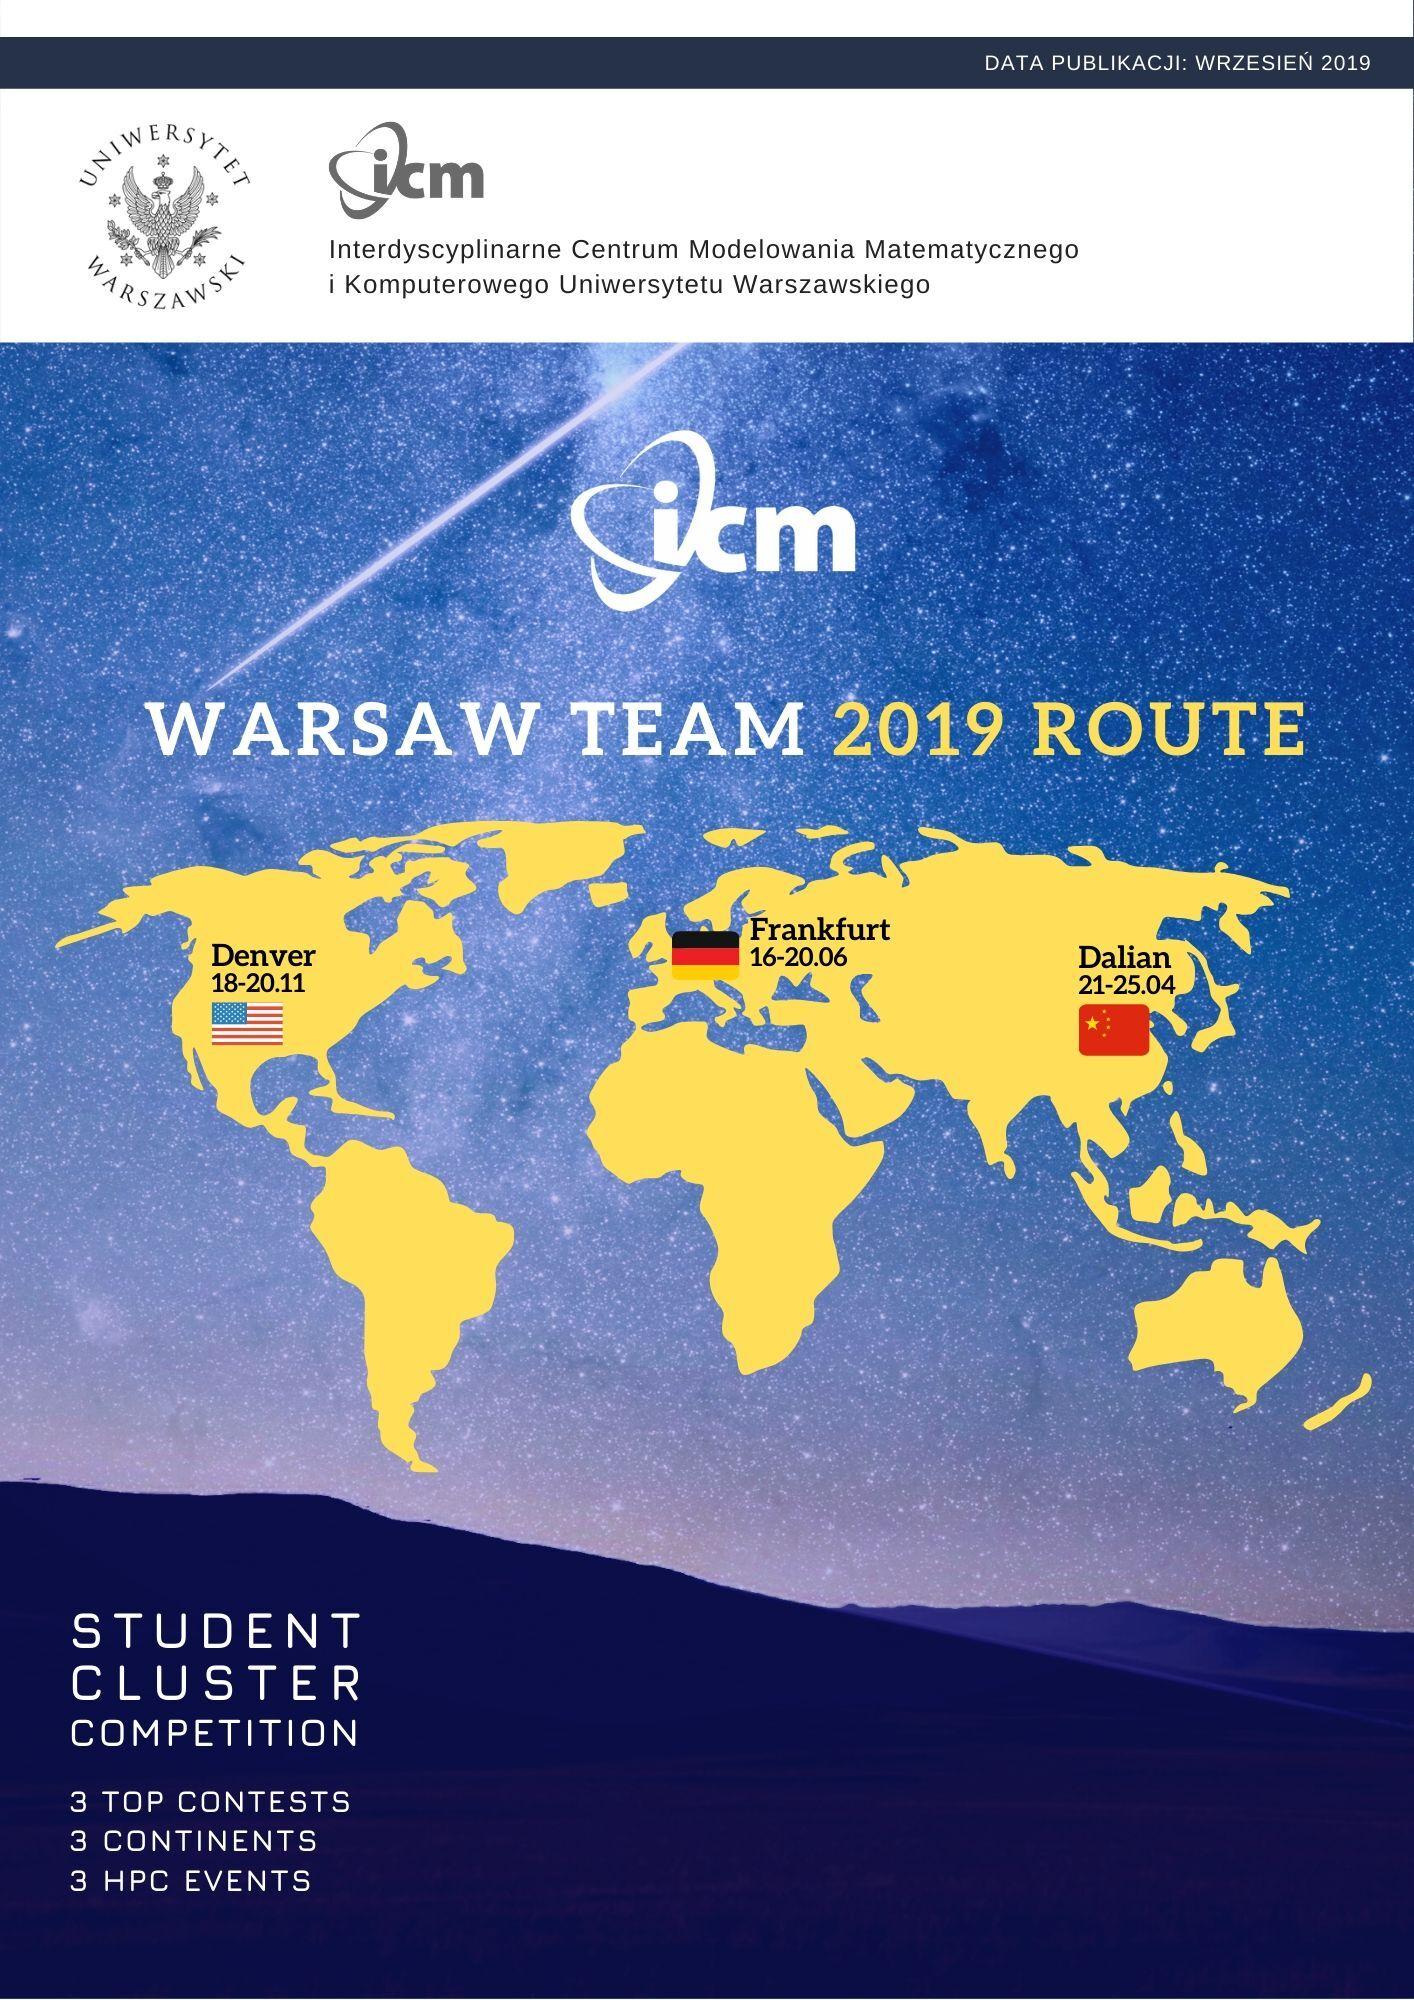 Warsaw team